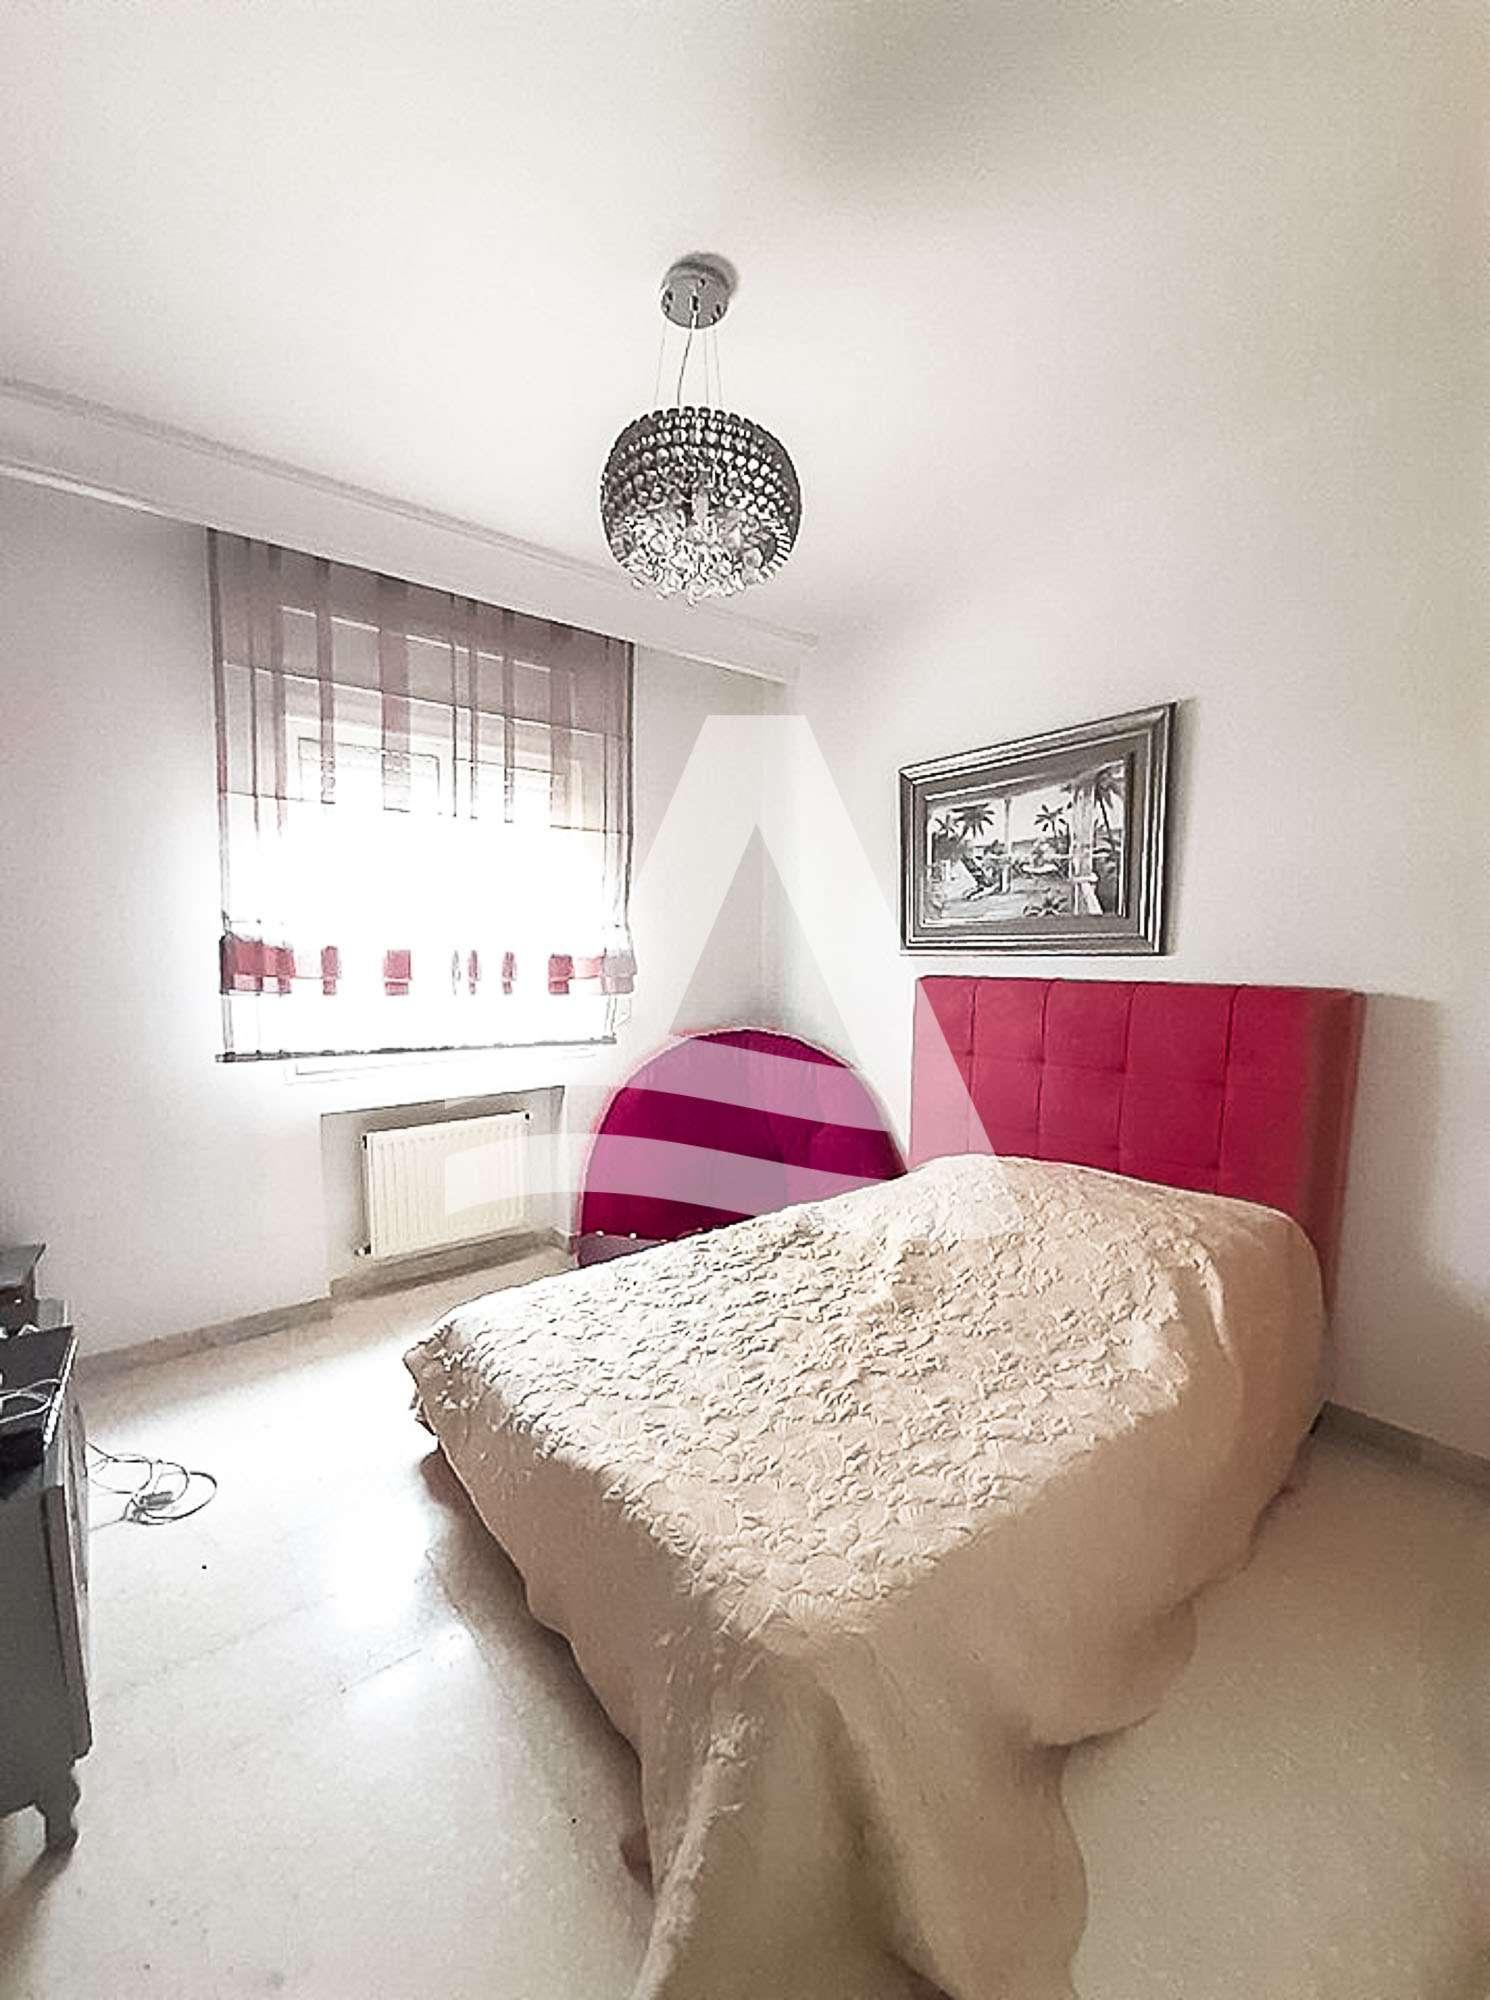 httpss3.amazonaws.comlogimoaws_Arcane_immobilière_la_Marsa-_location_-_vente_la_marsa_5_sur_16_1574071698413-1